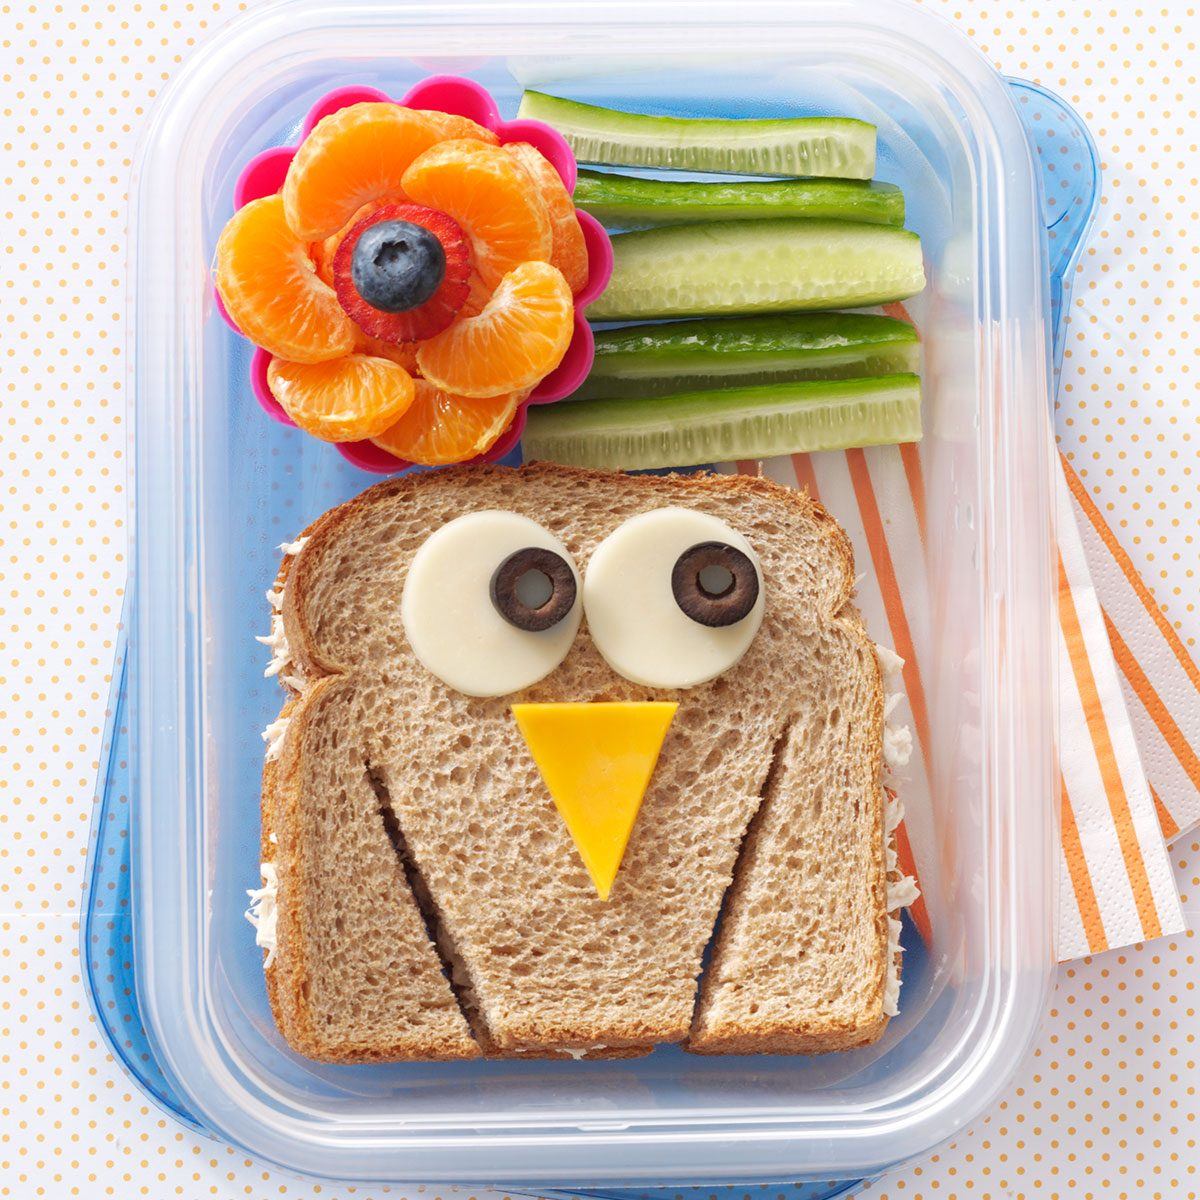 Fun Home Ideas: 16 Fun Food Ideas